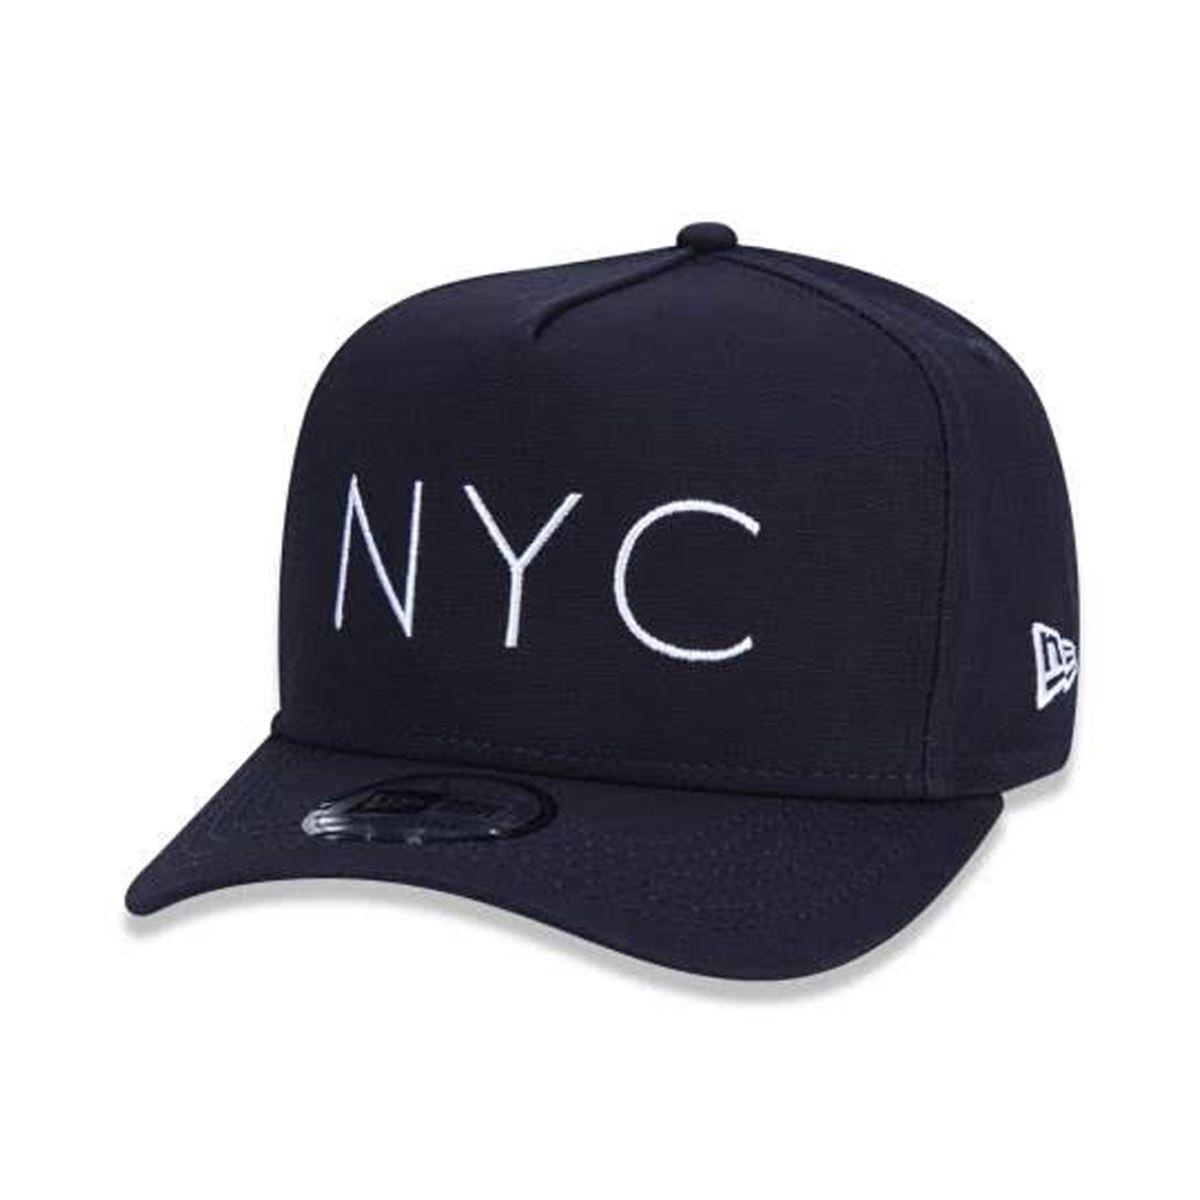 Boné New Era Masculino NYC Azul Marinho